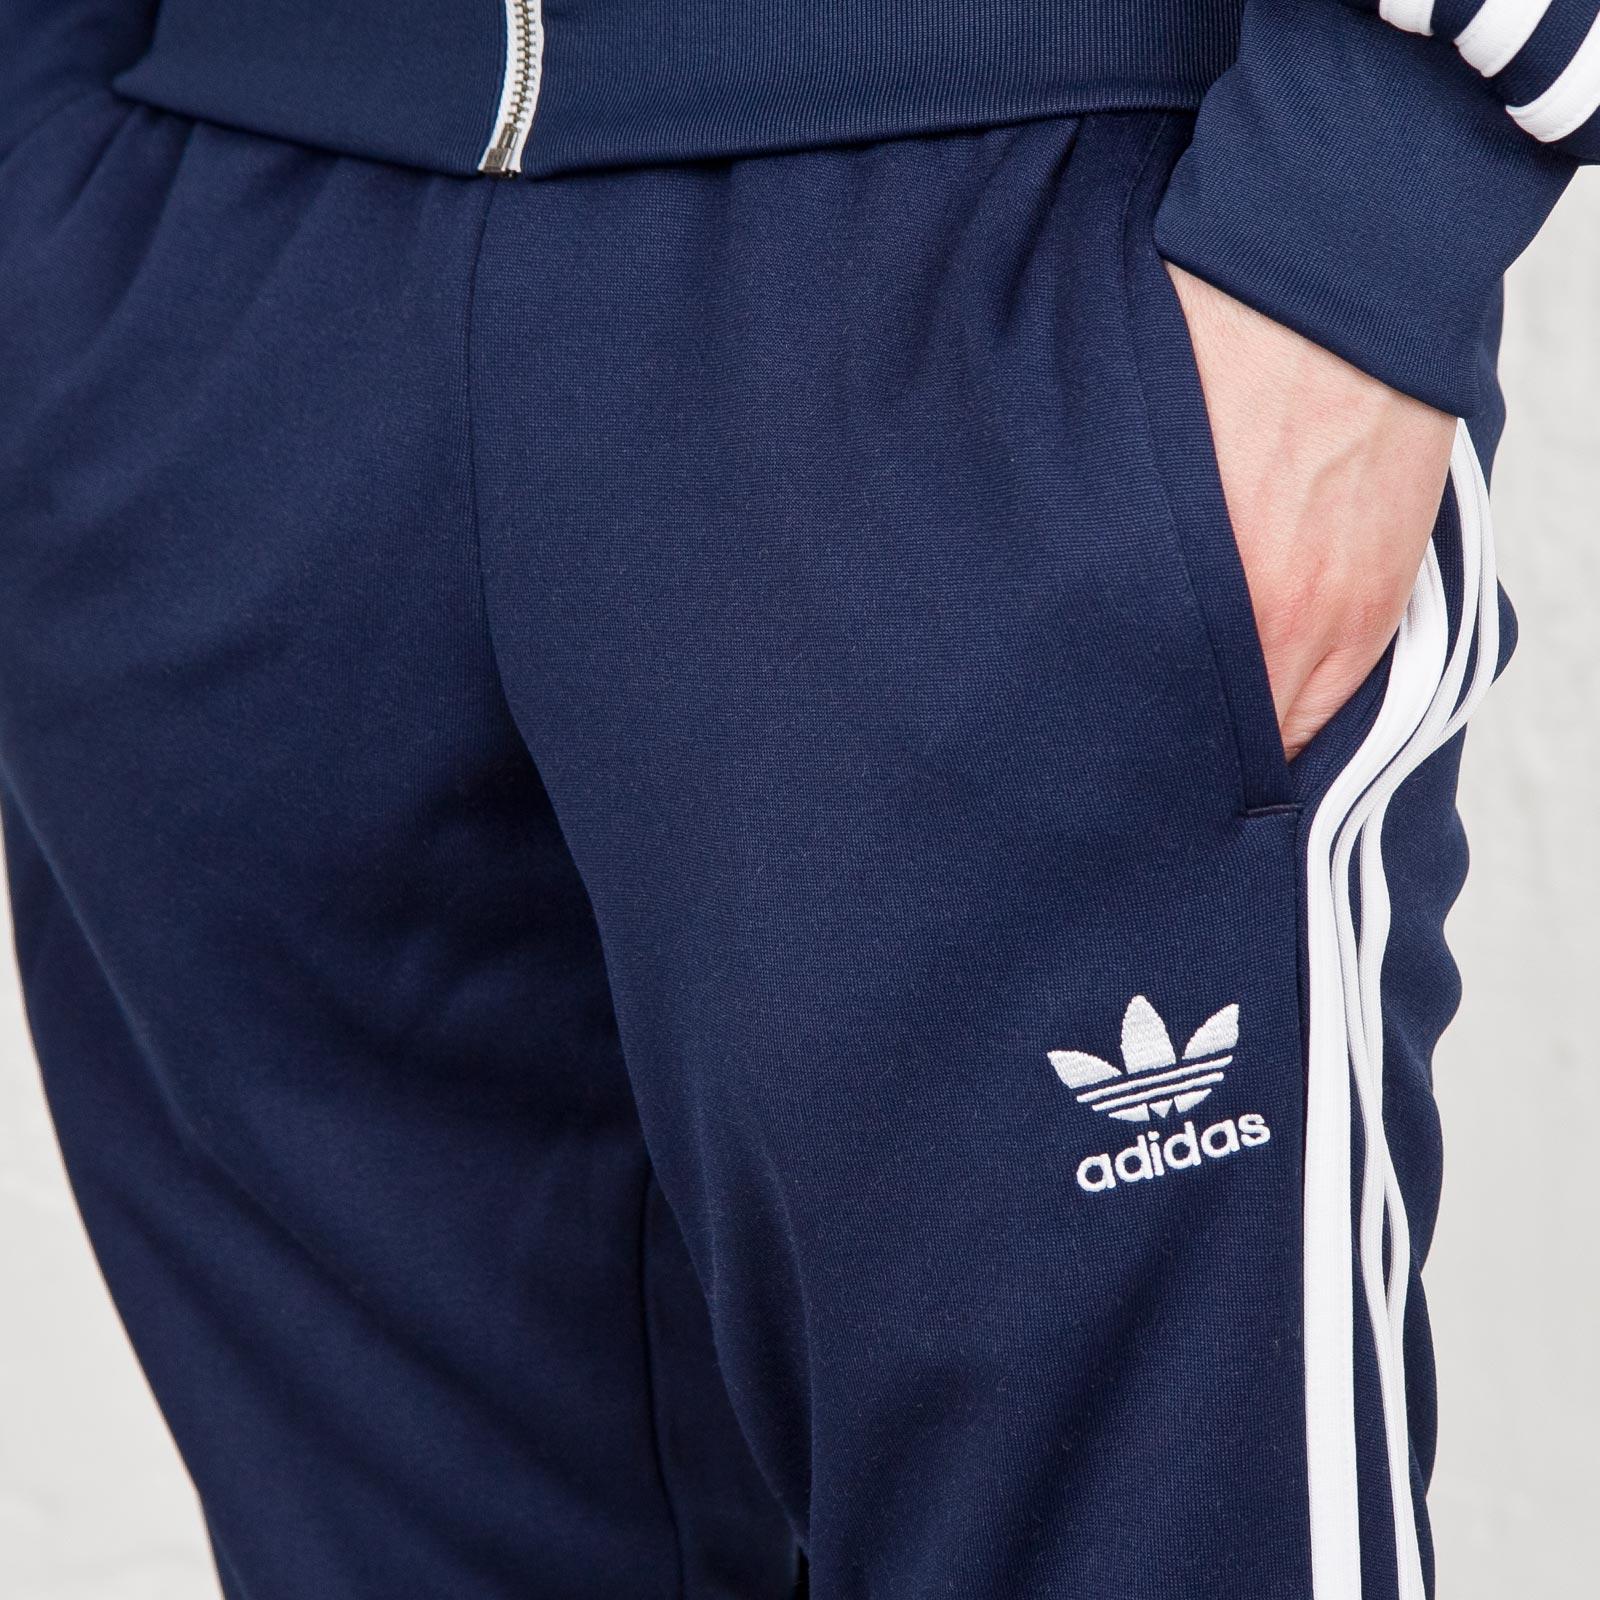 fc400b21271 adidas Superstar Cuffed Track Pants - S89368 - Sneakersnstuff | sneakers &  streetwear online since 1999